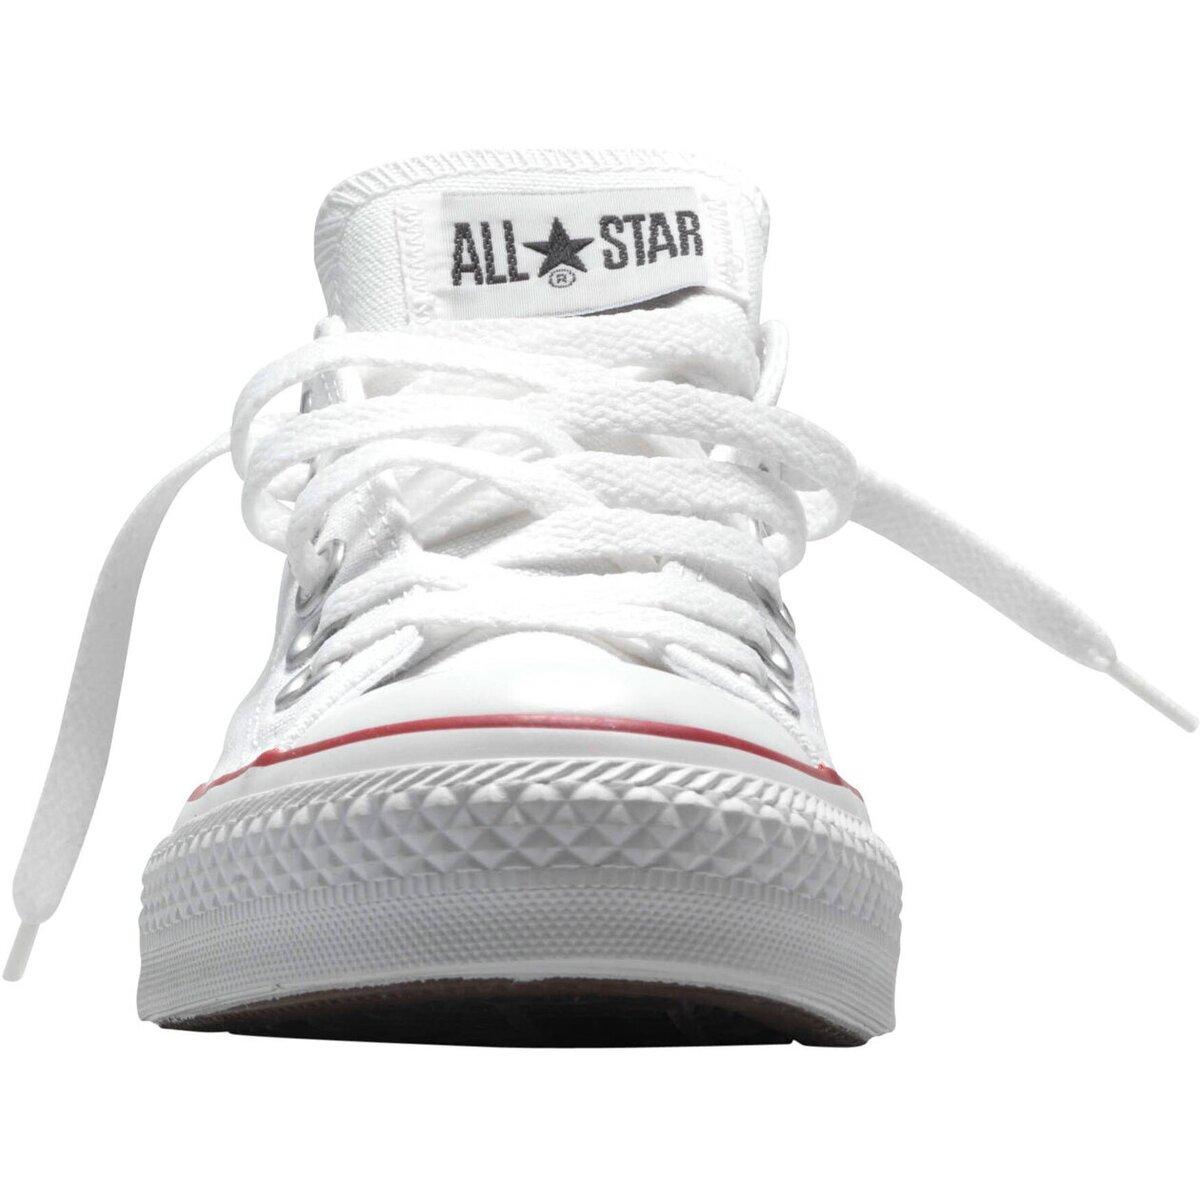 Bild 3 von CONVERSE Sneaker AS Core OX - optical white